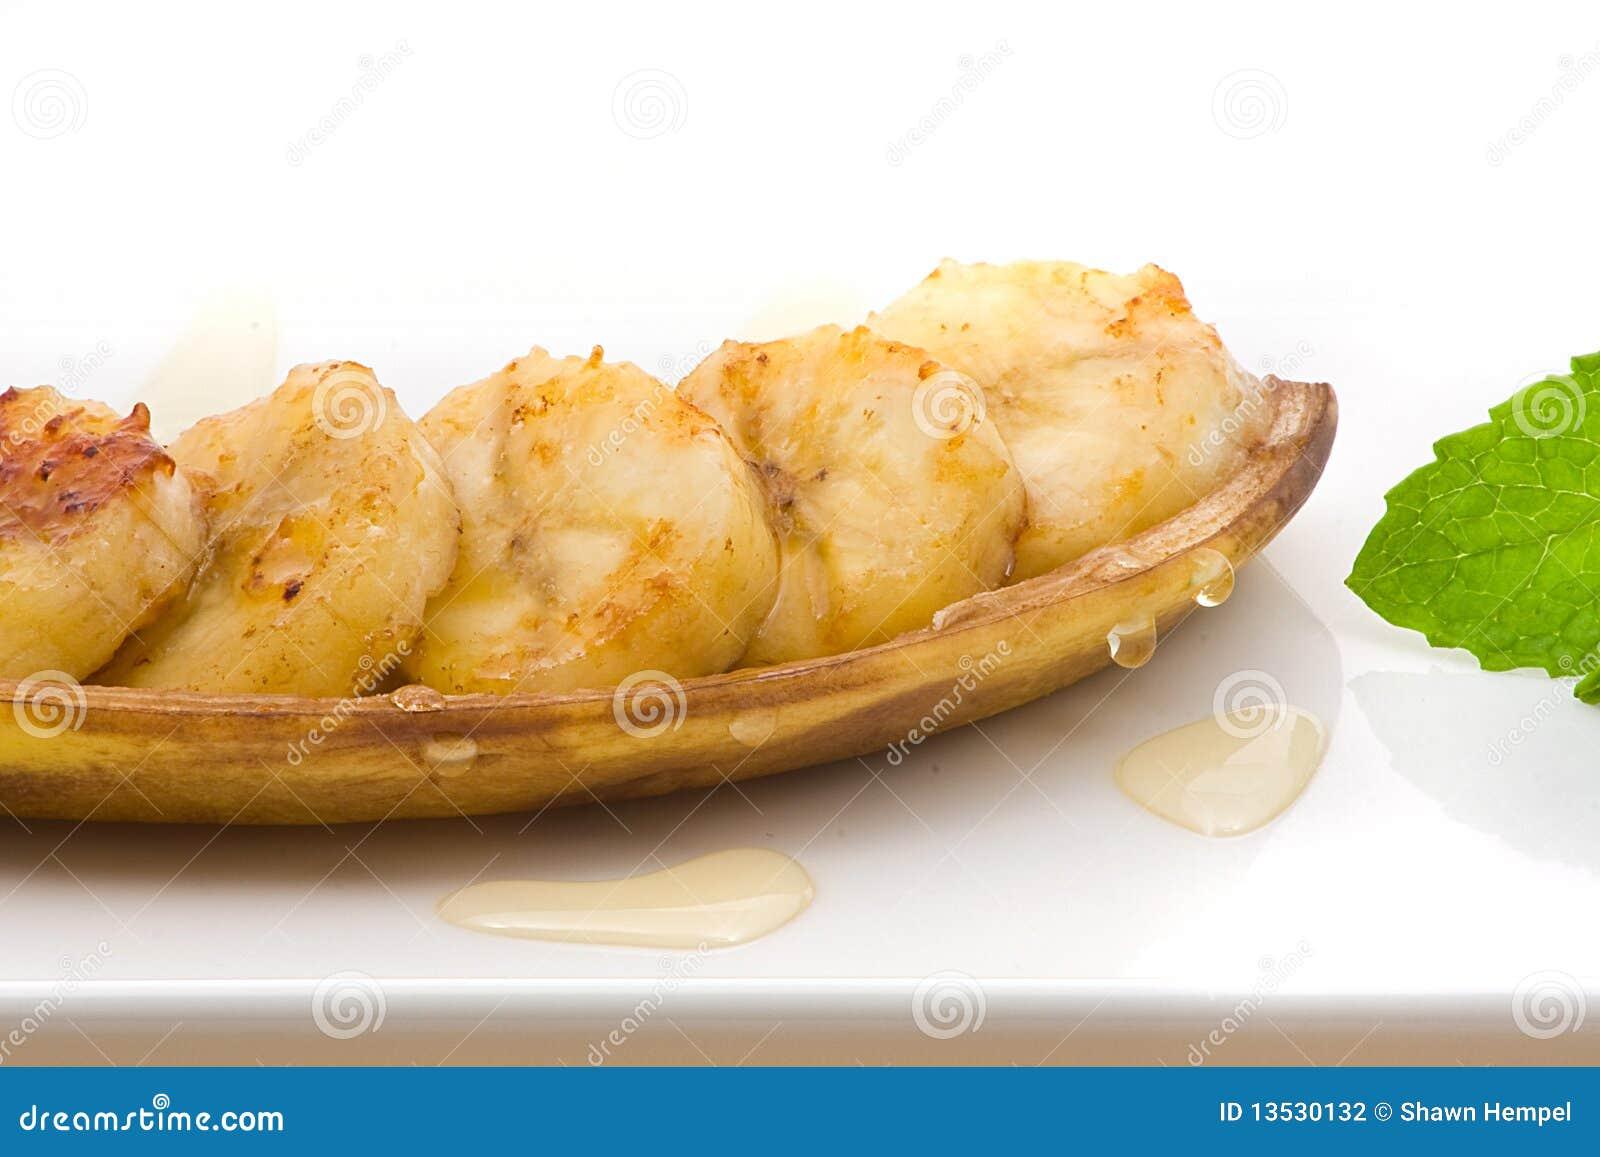 Baked Banana Stock Photography - Image: 13530132